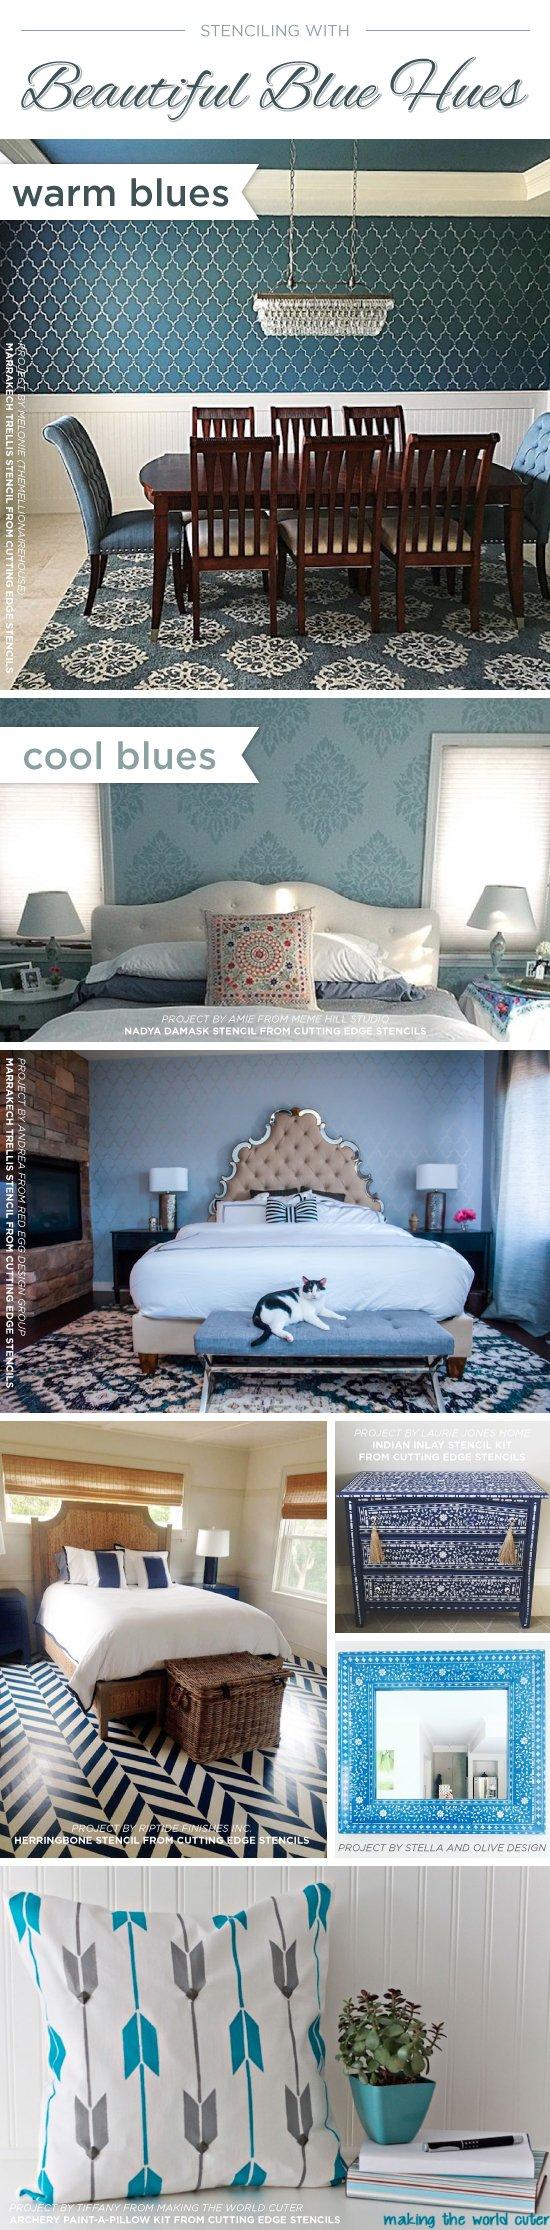 Cutting Edge Stencils shares beautiful blue room ideas and home decor accessories. http://www.cuttingedgestencils.com/wall-stencils.html